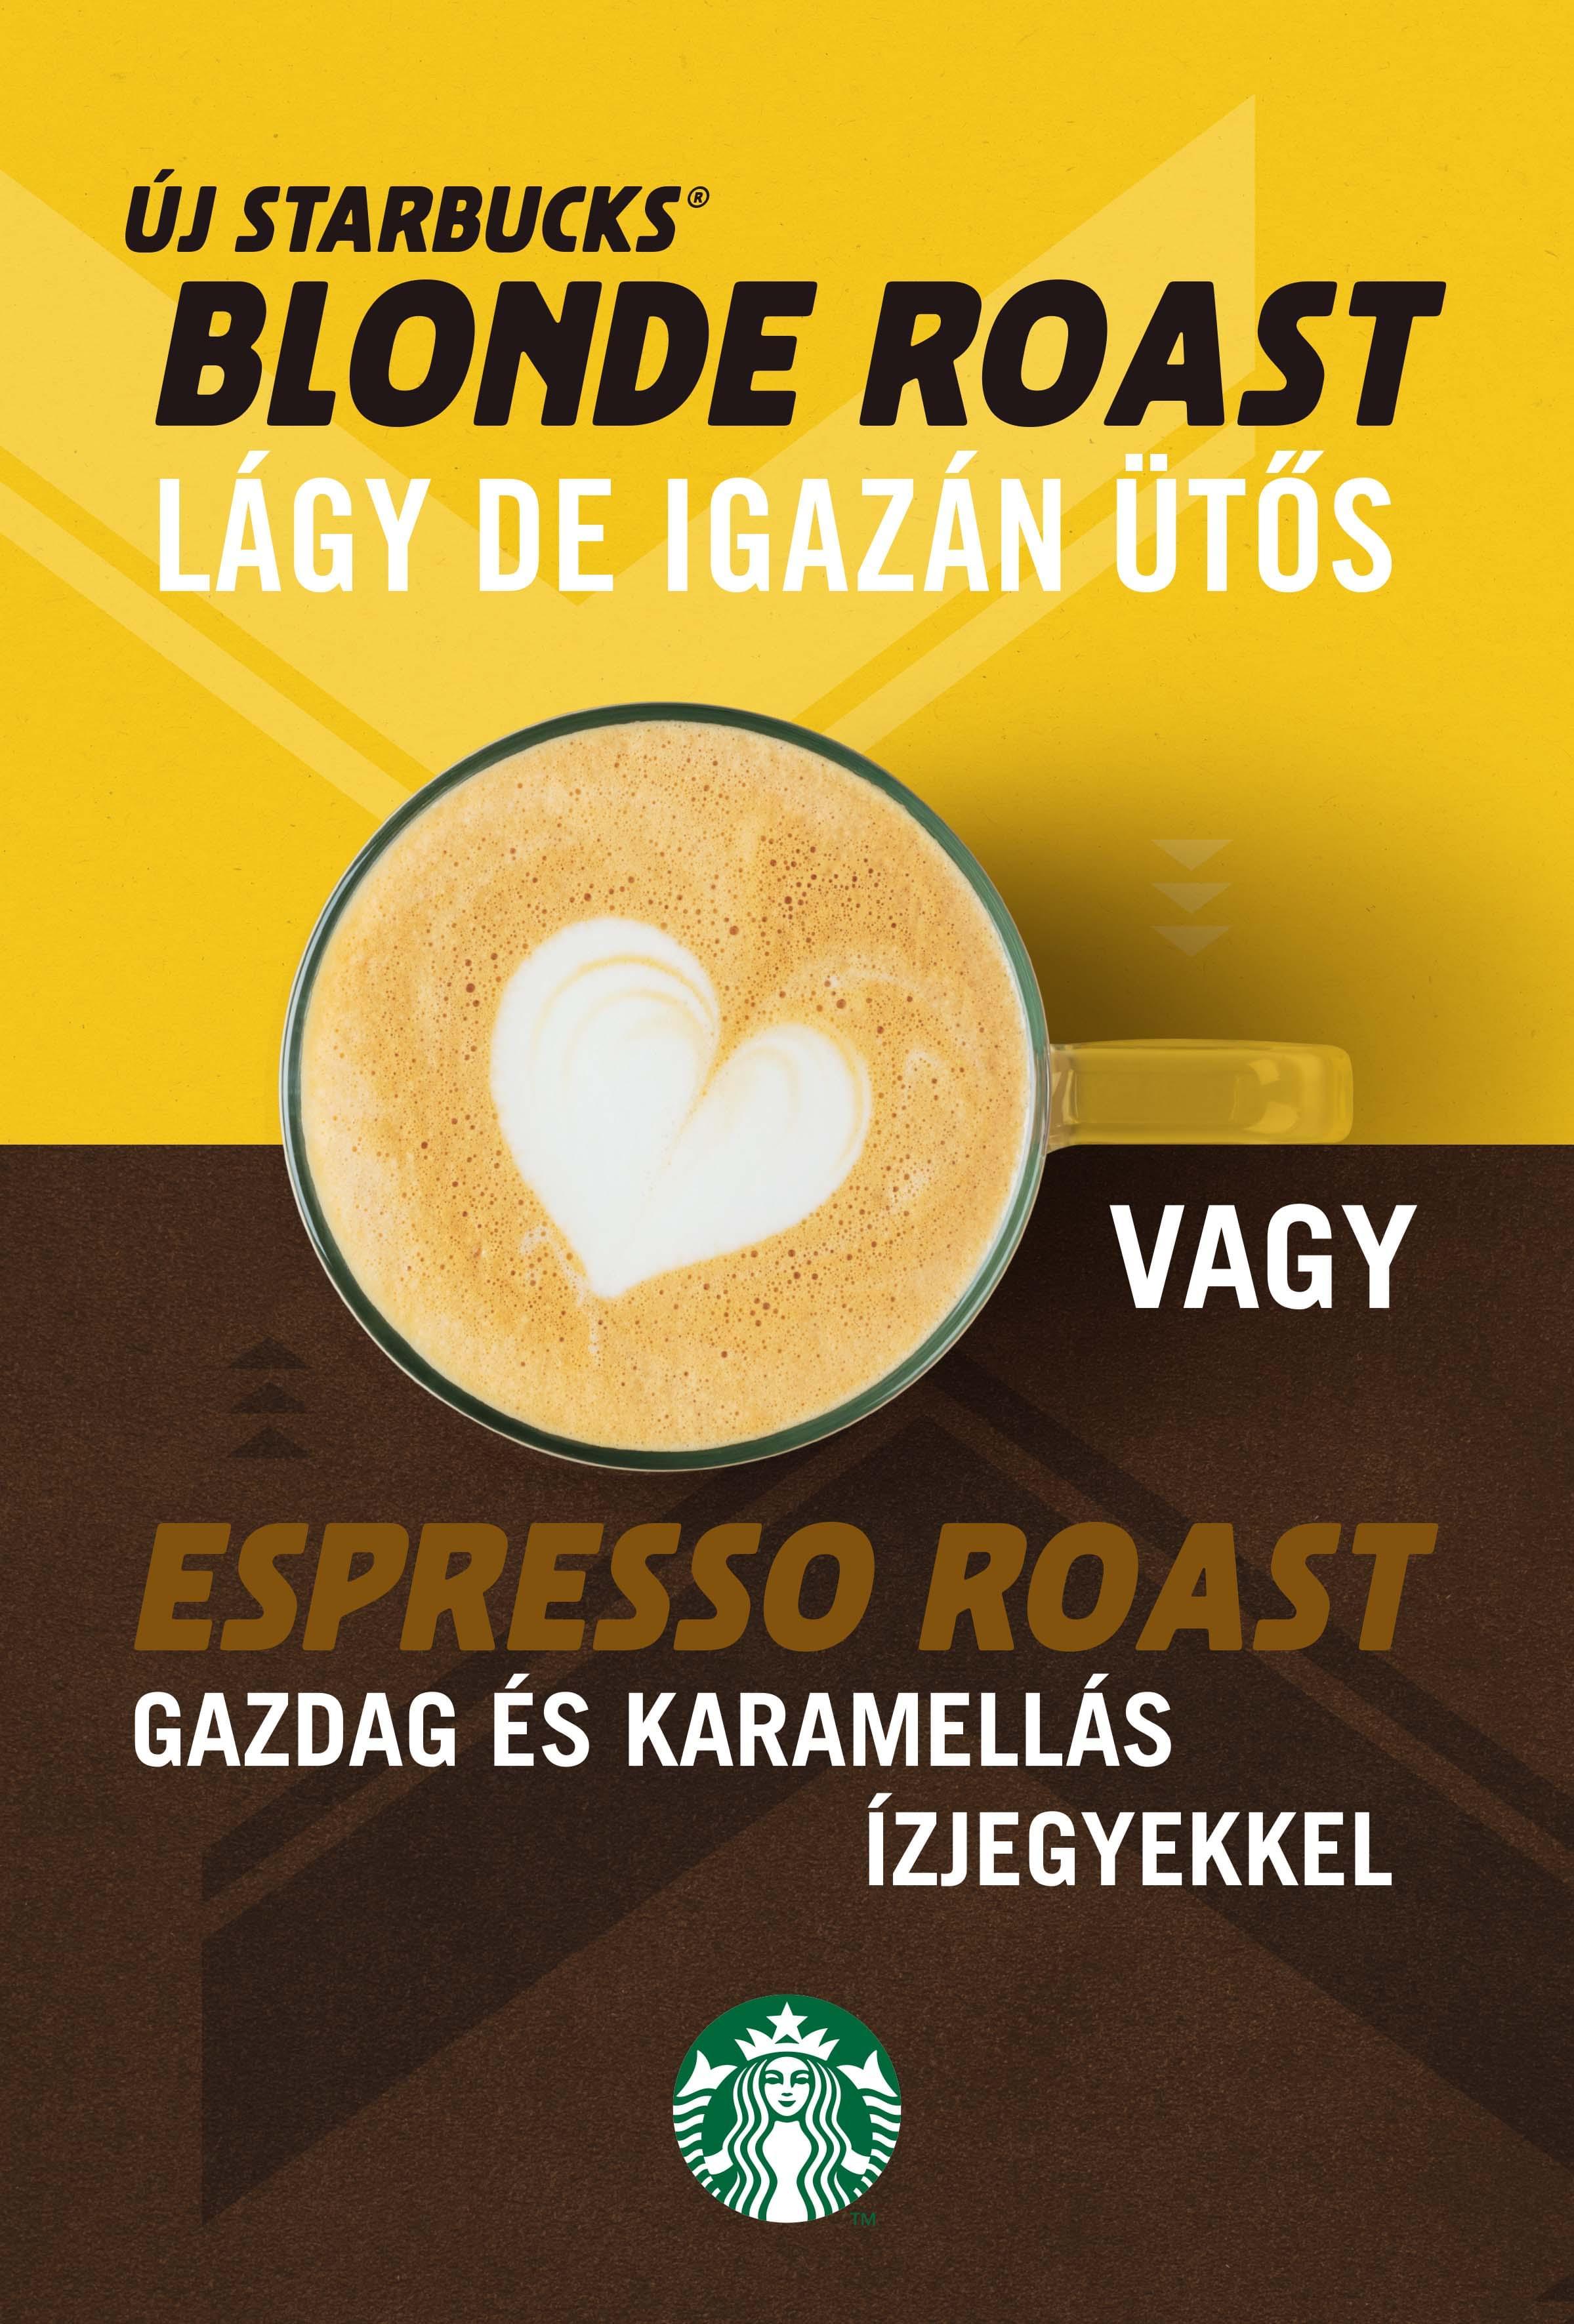 Starbucks Blonde Espresso Roast Launches In Stores Around